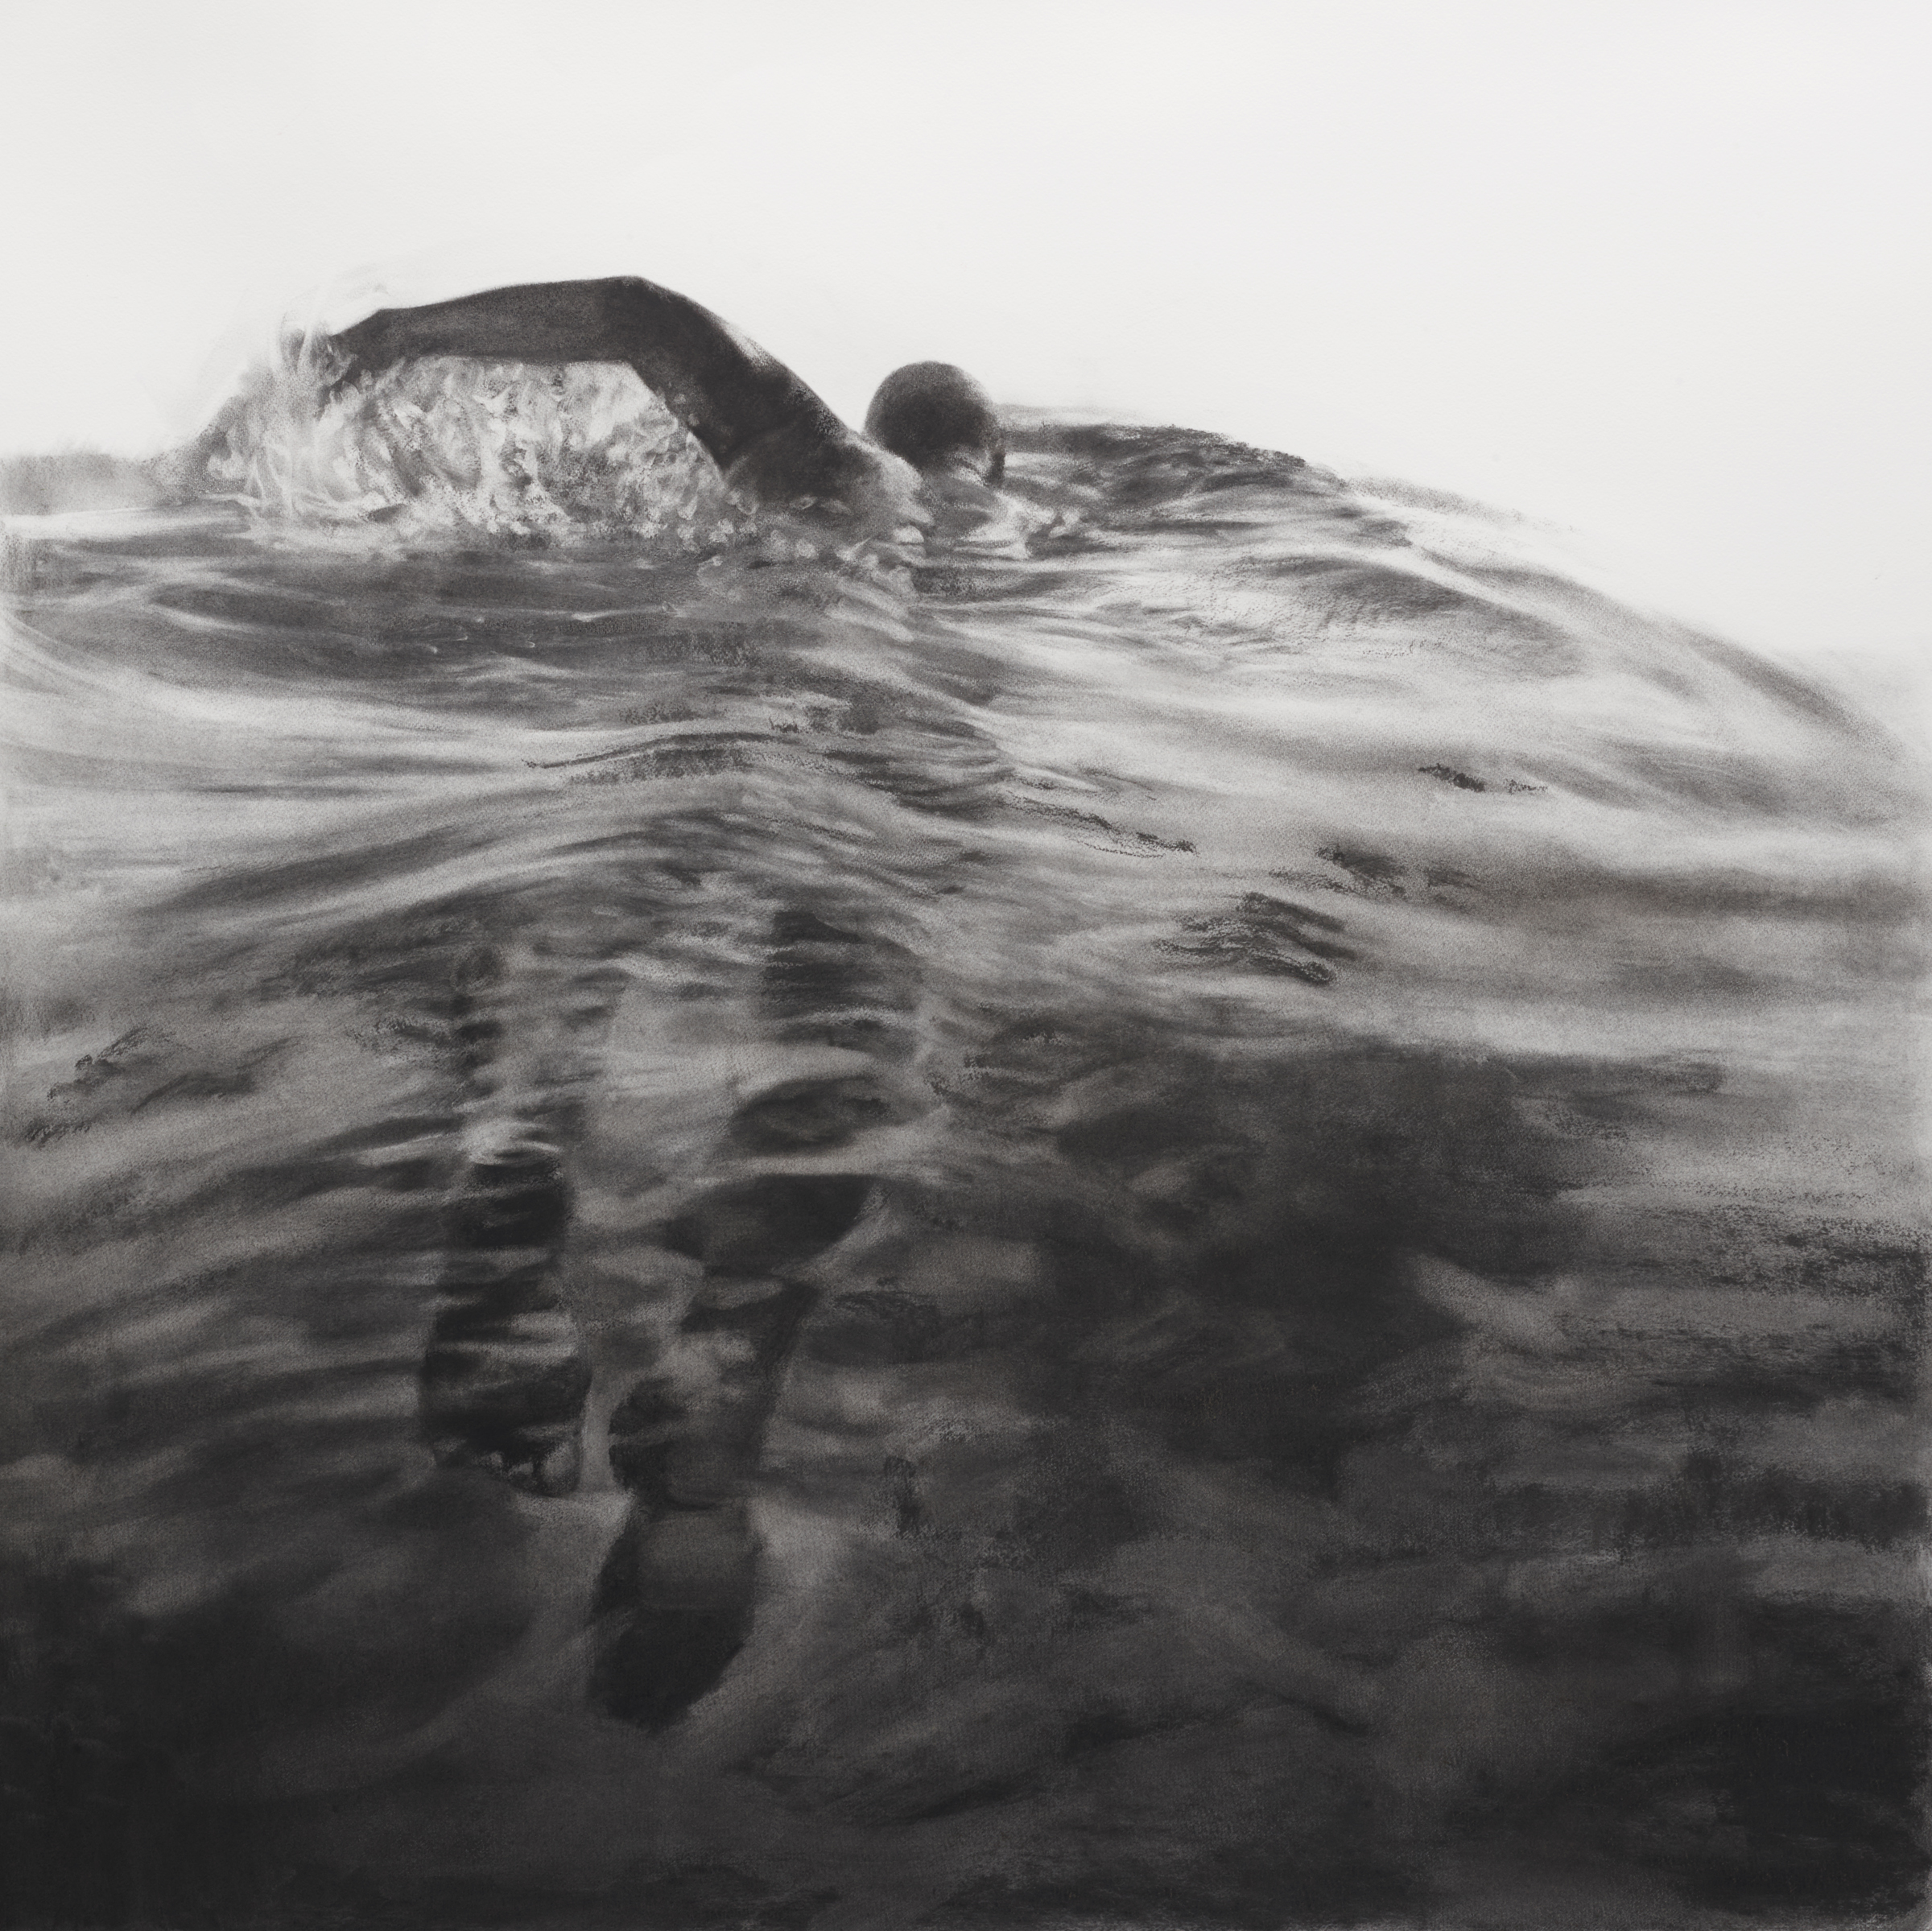 Artist: Patsy McArthur  Title: Sea Swimmer I  Size: 105 x 105 cm  Medium: Charcoal on paper  Price: £3500